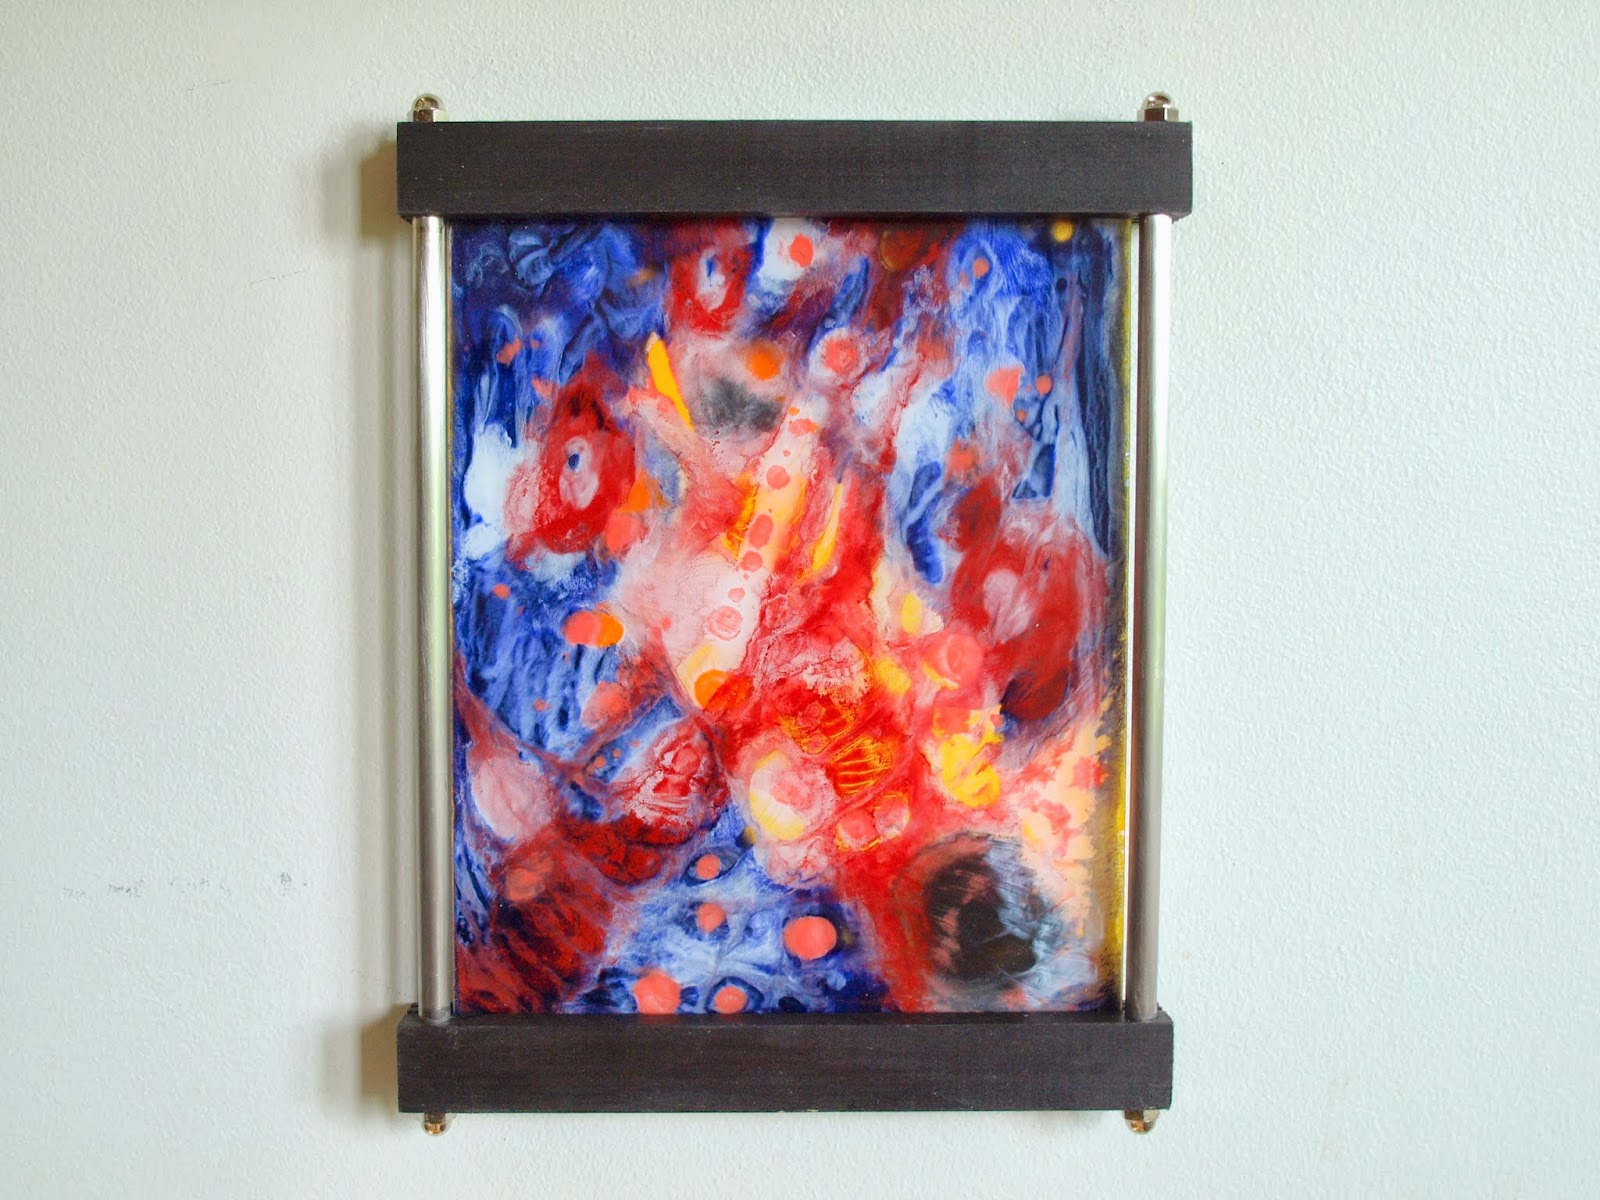 Year of Experimentation in Encaustic on Glass | Arte Arte Dan